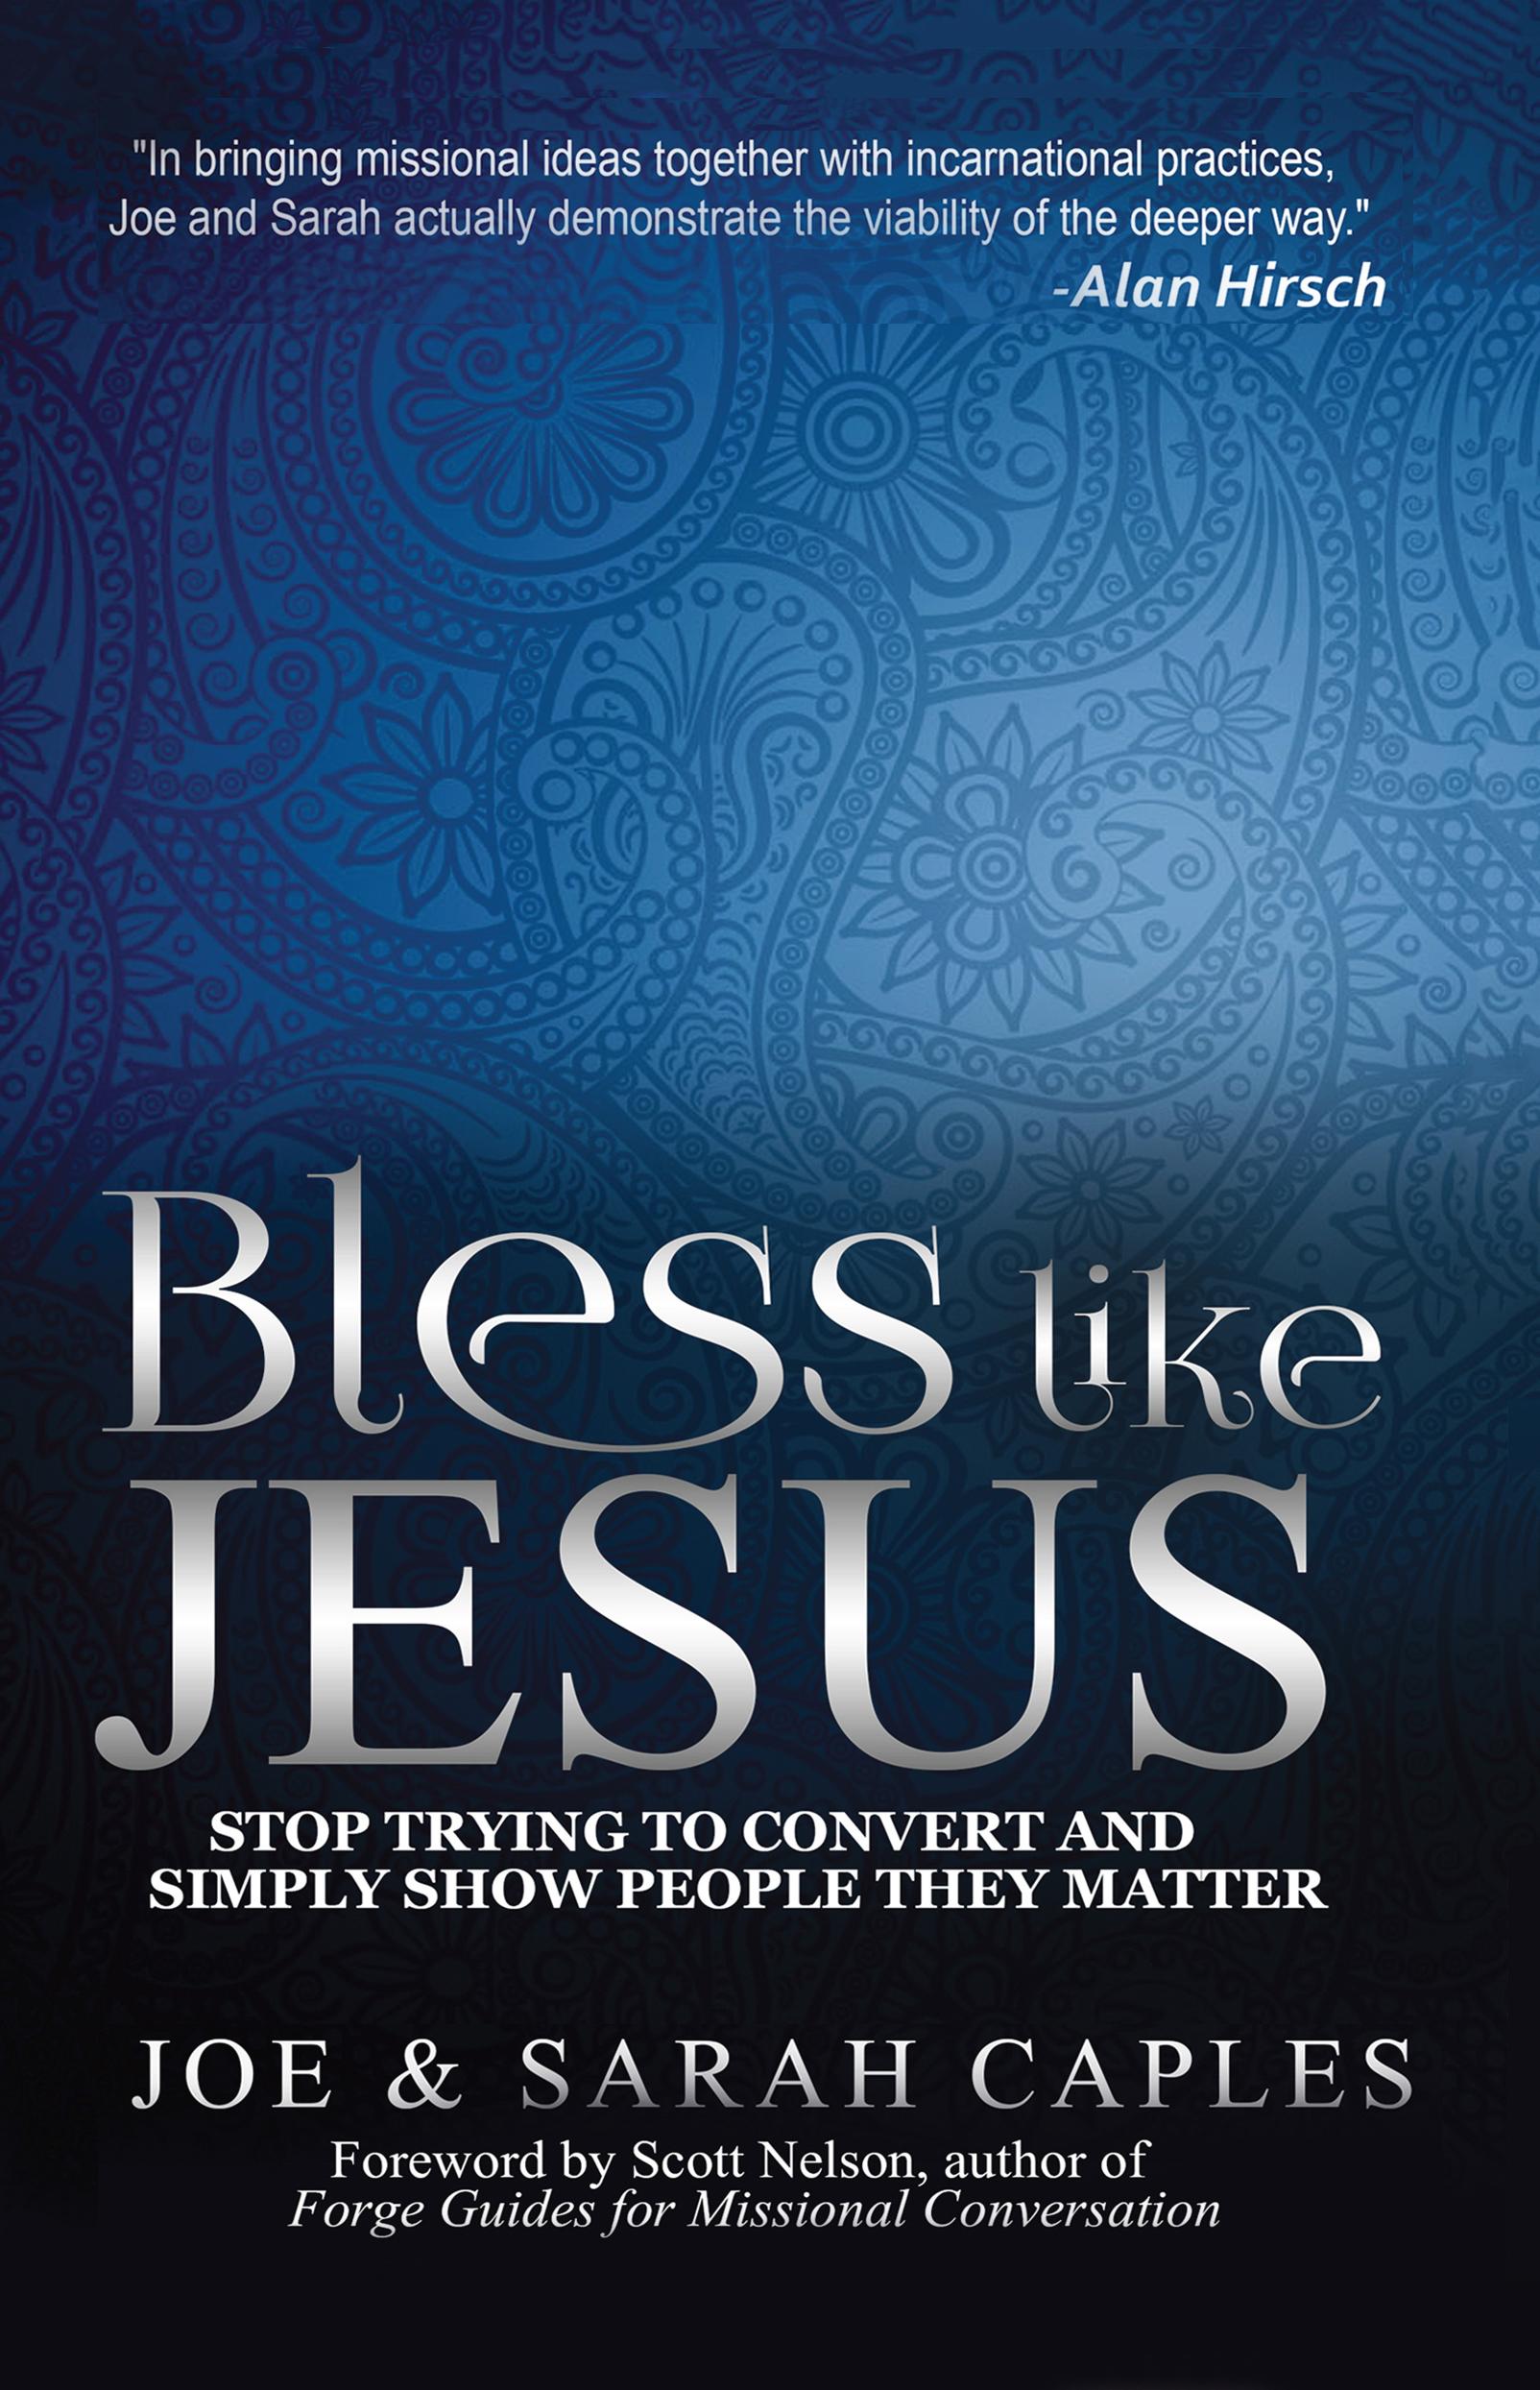 Bless Like Jesus by Joe and Sarah Caples